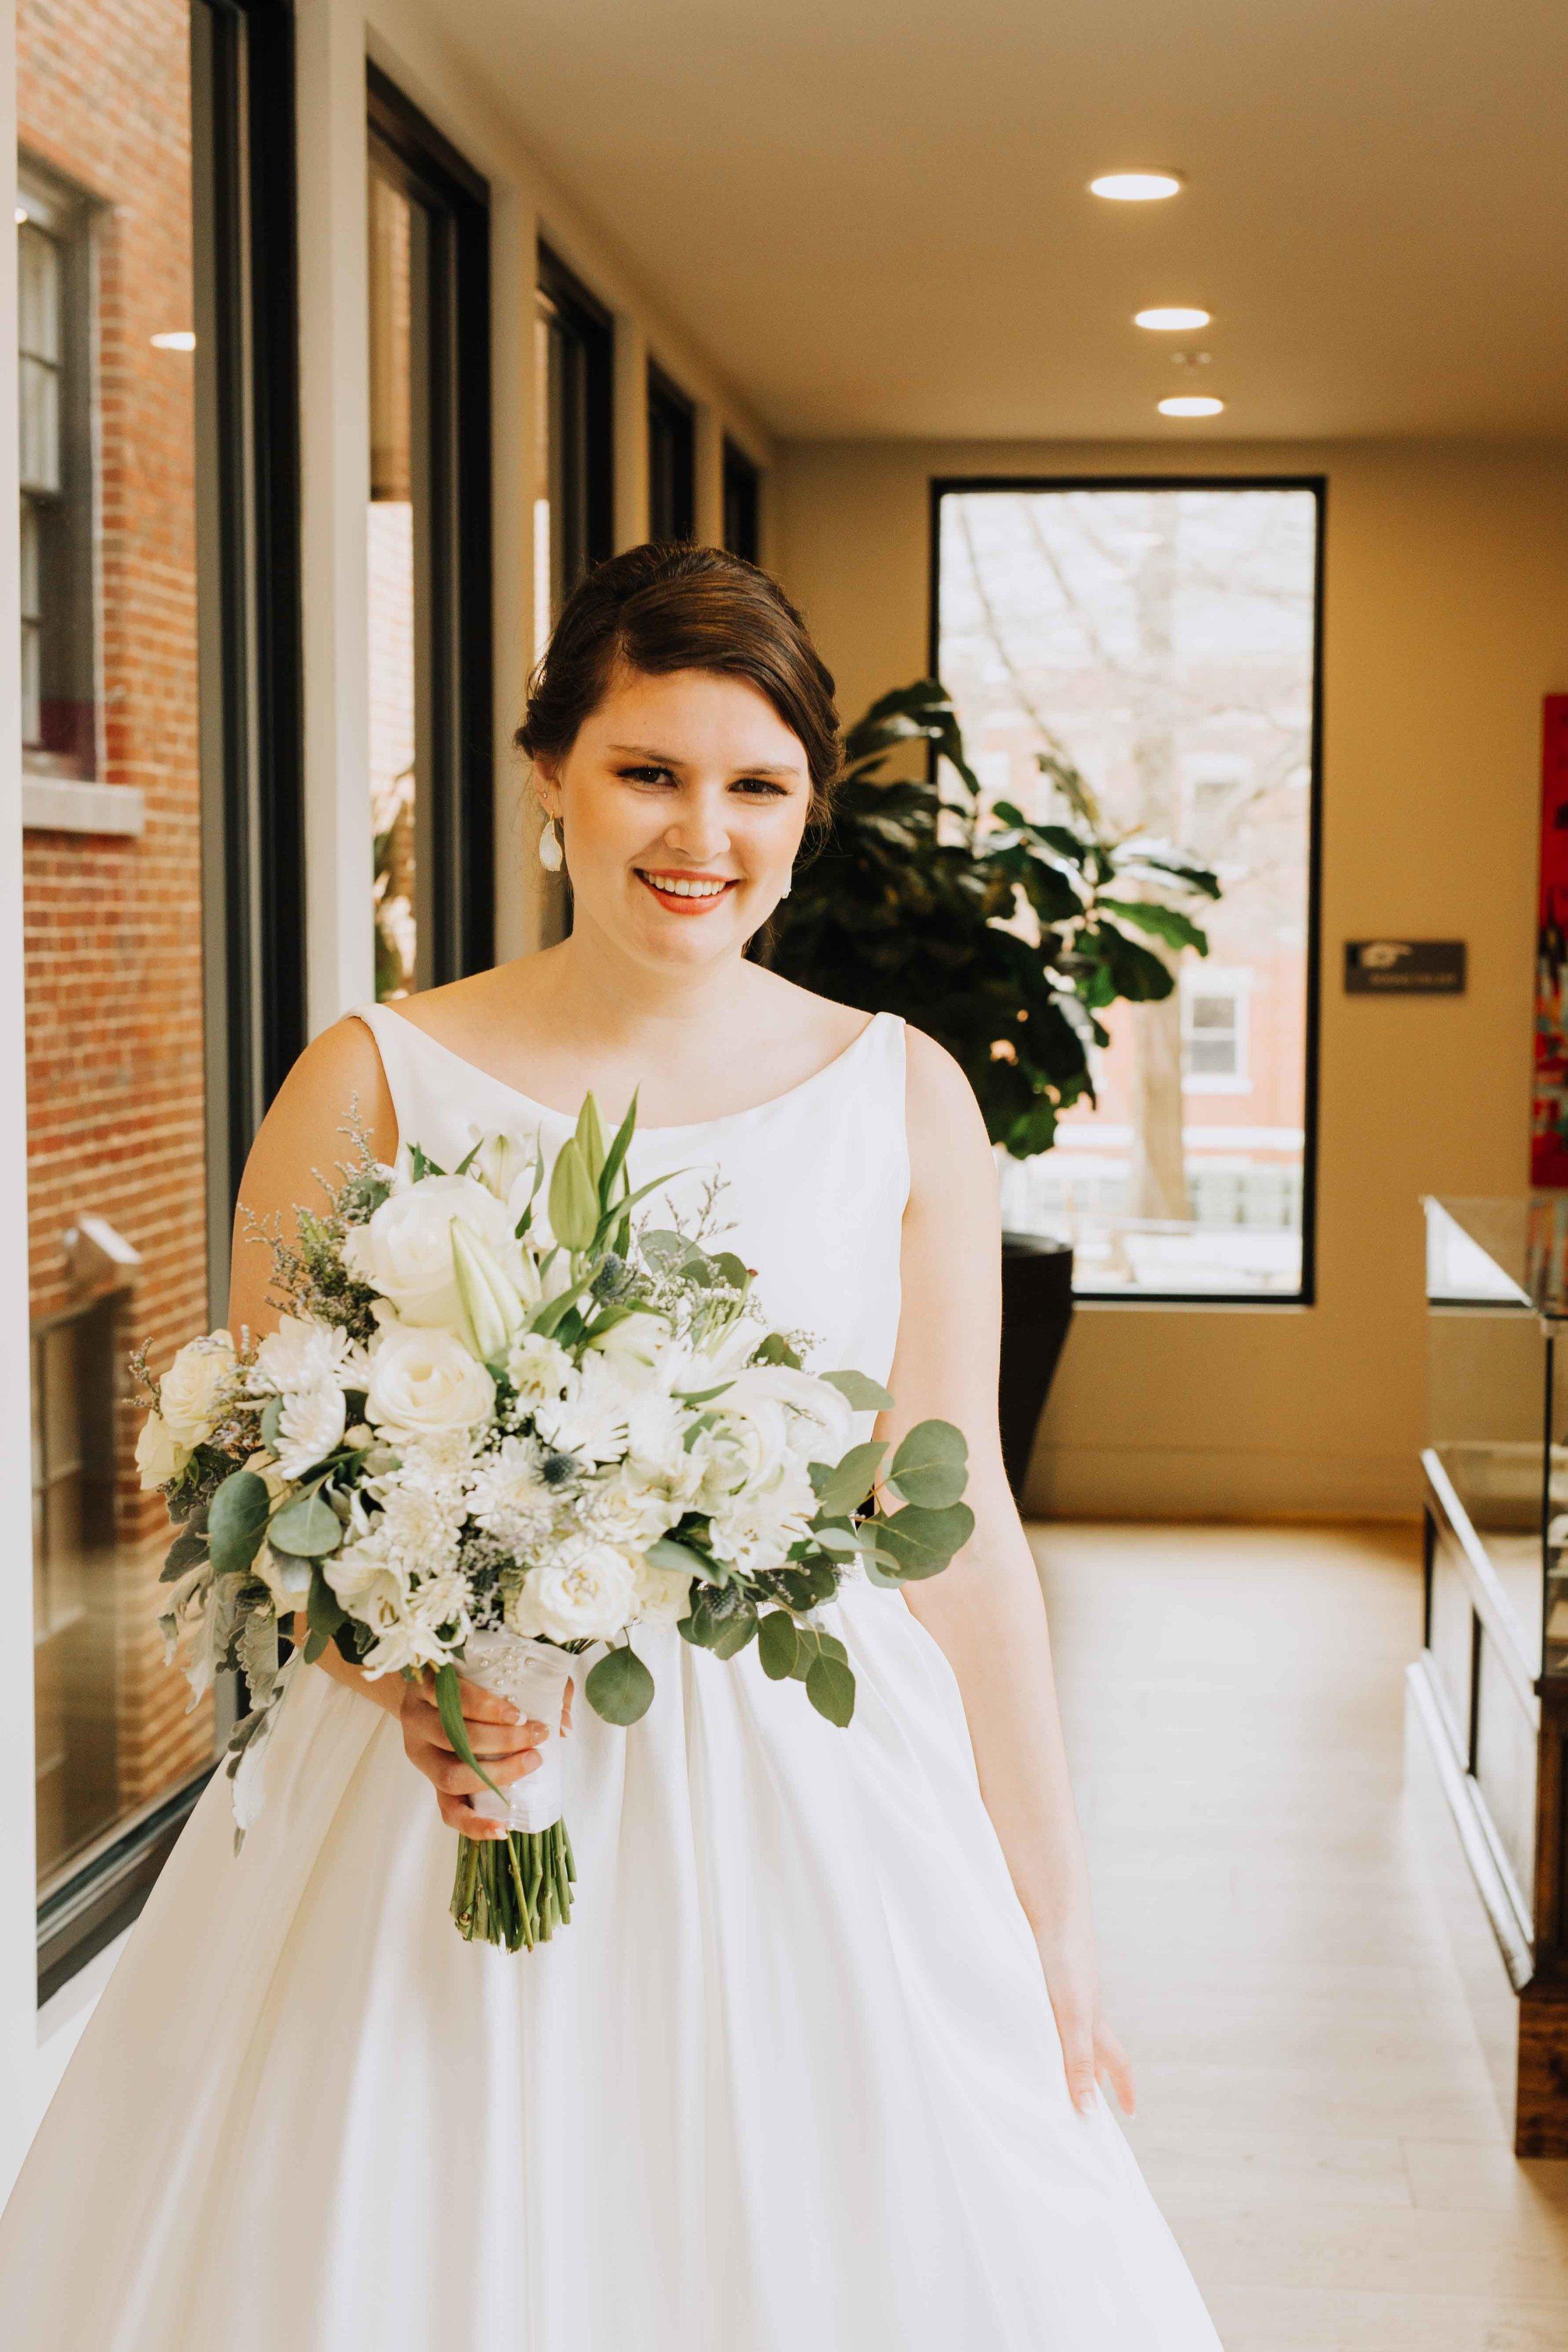 Farmville-Virginia-Wedding-Hotel-Weynoke-Downtown-Jacqueline-Waters-Photography-Detailed- (643).jpg